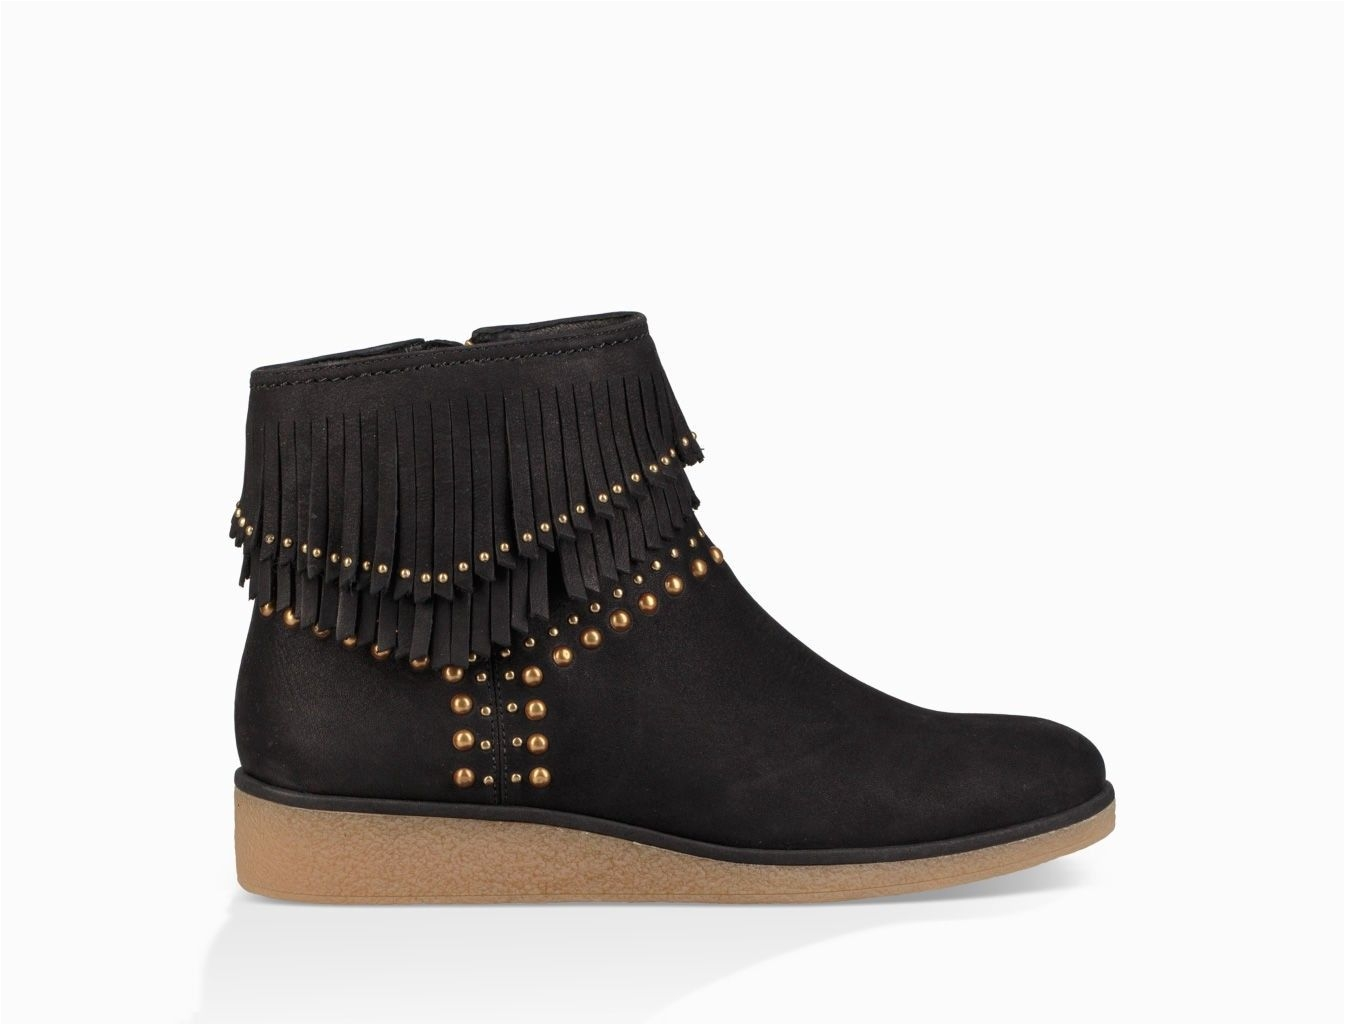 Light Pink Uggs Ugg Ariane Ugg Shoes Ugg Pinterest Brown and Shopping